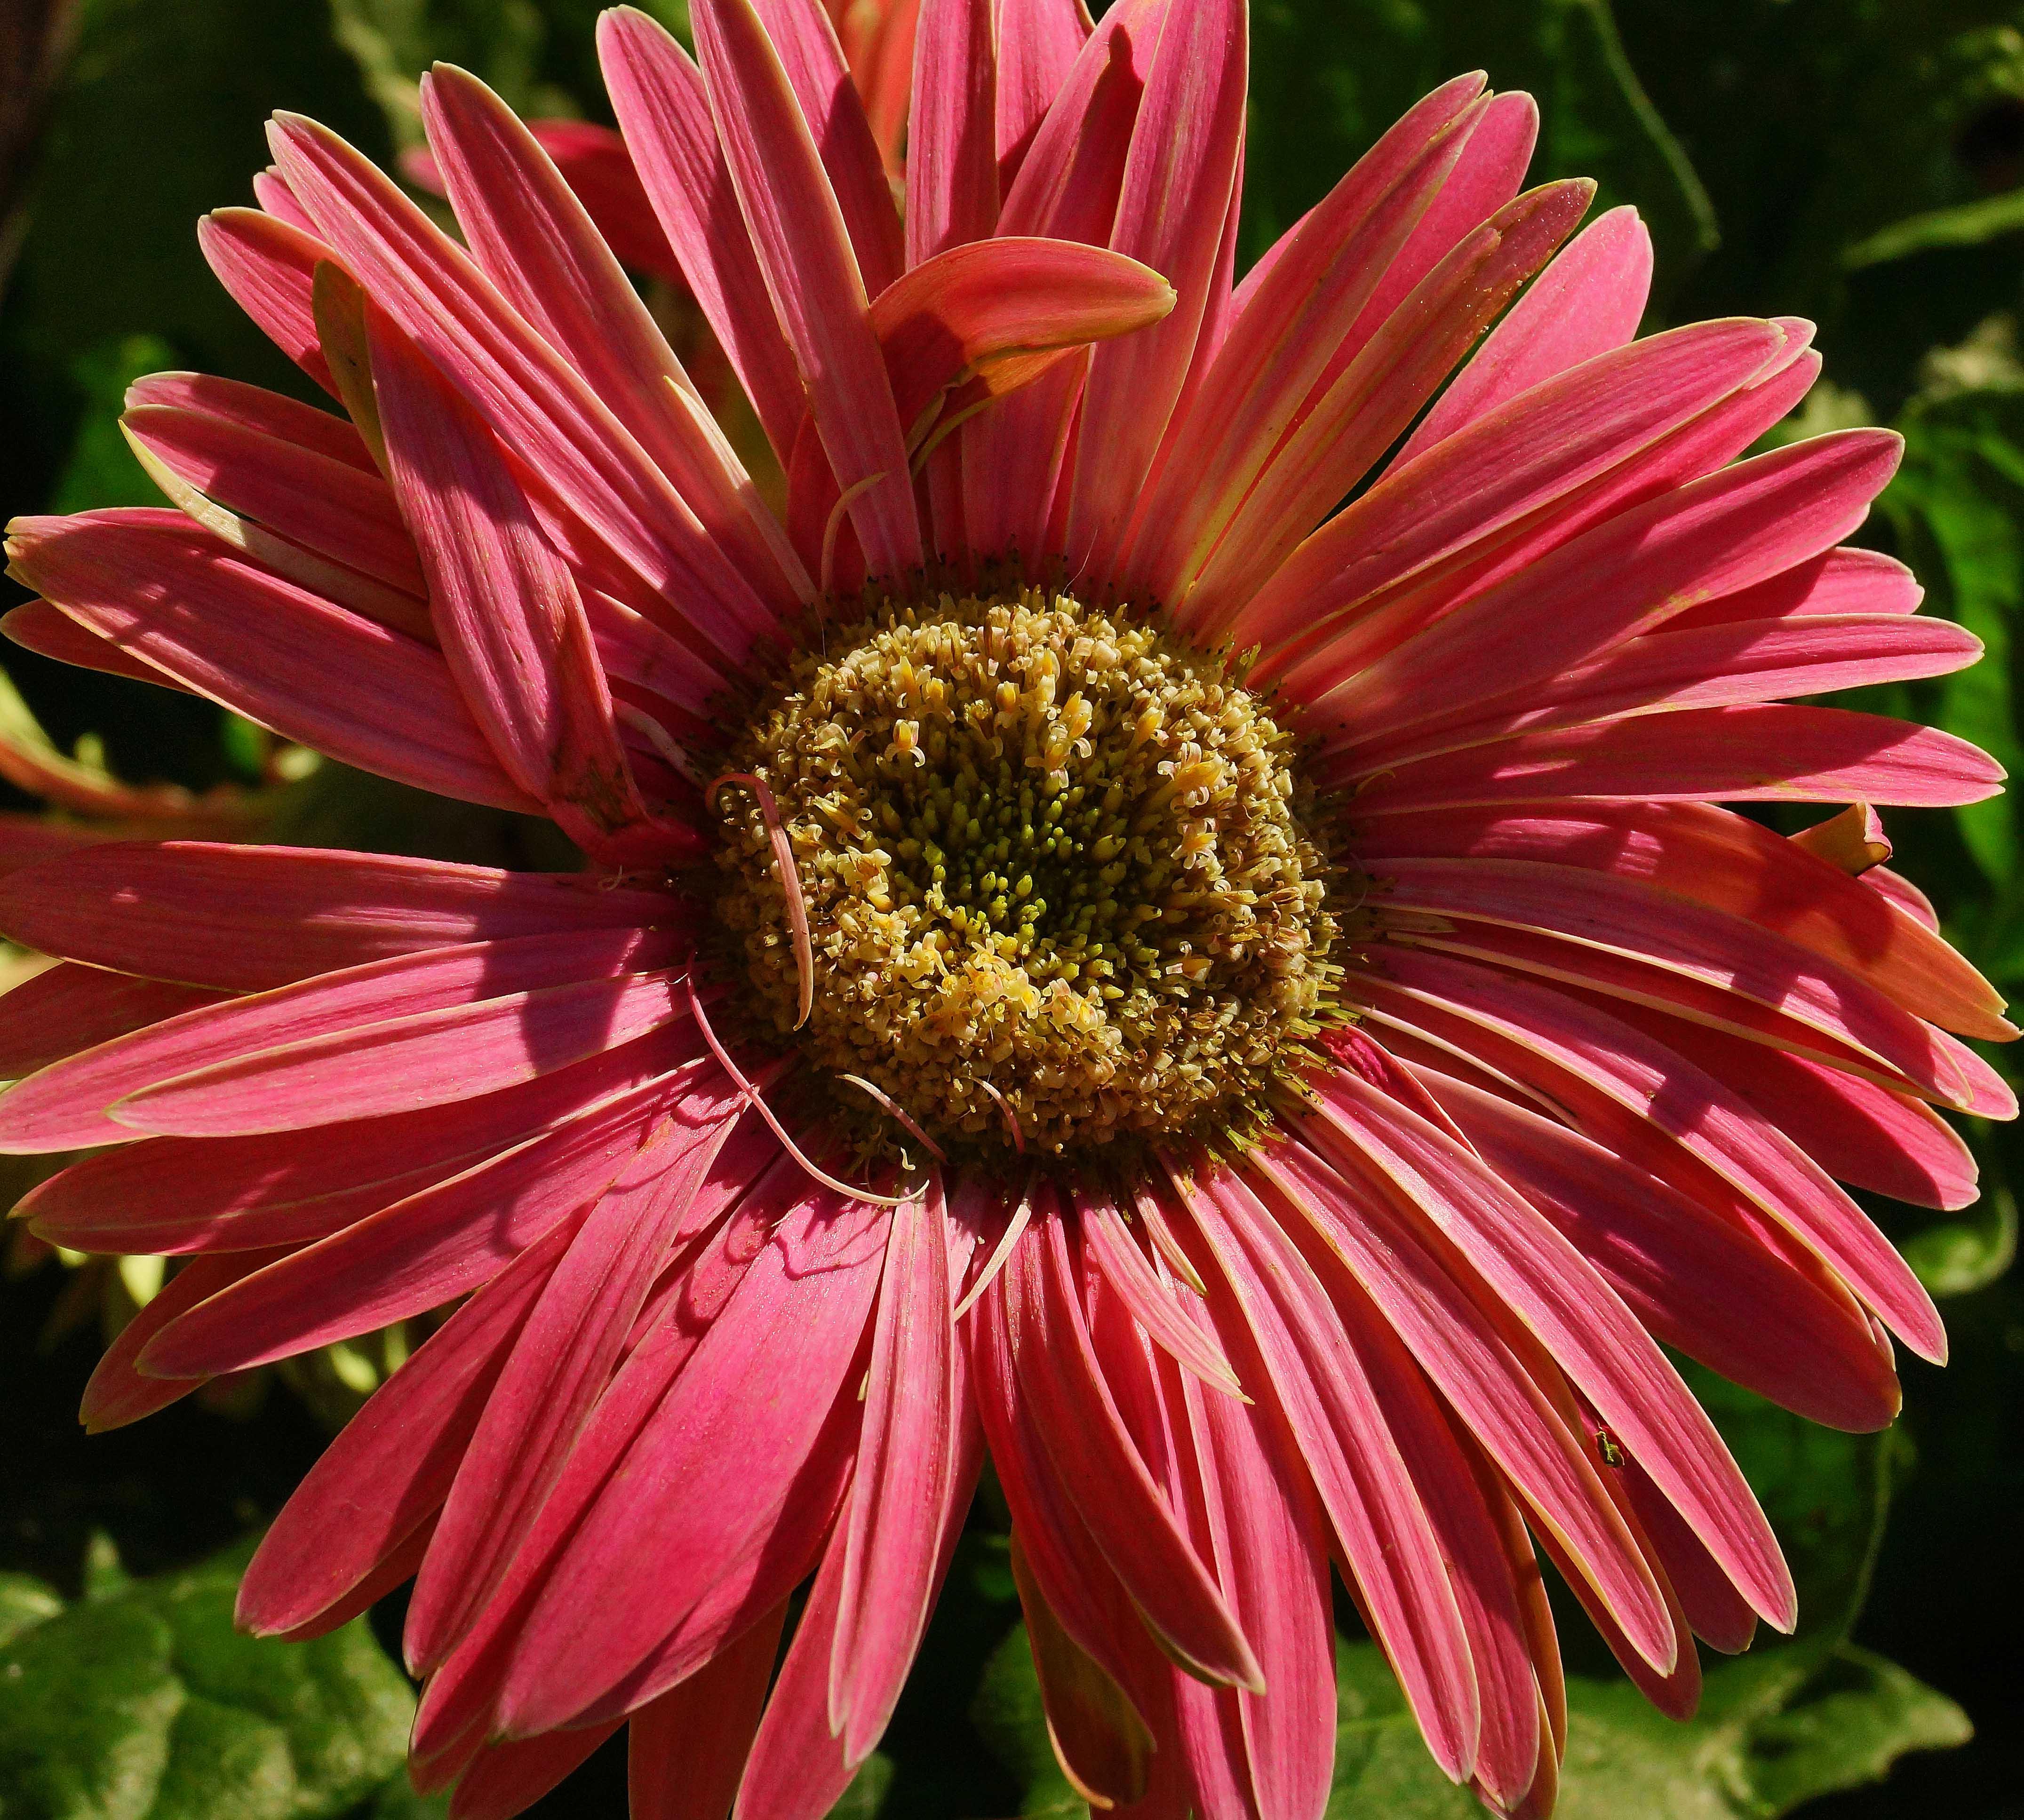 Free Images Nature Flower Petal Photo Botany Flora